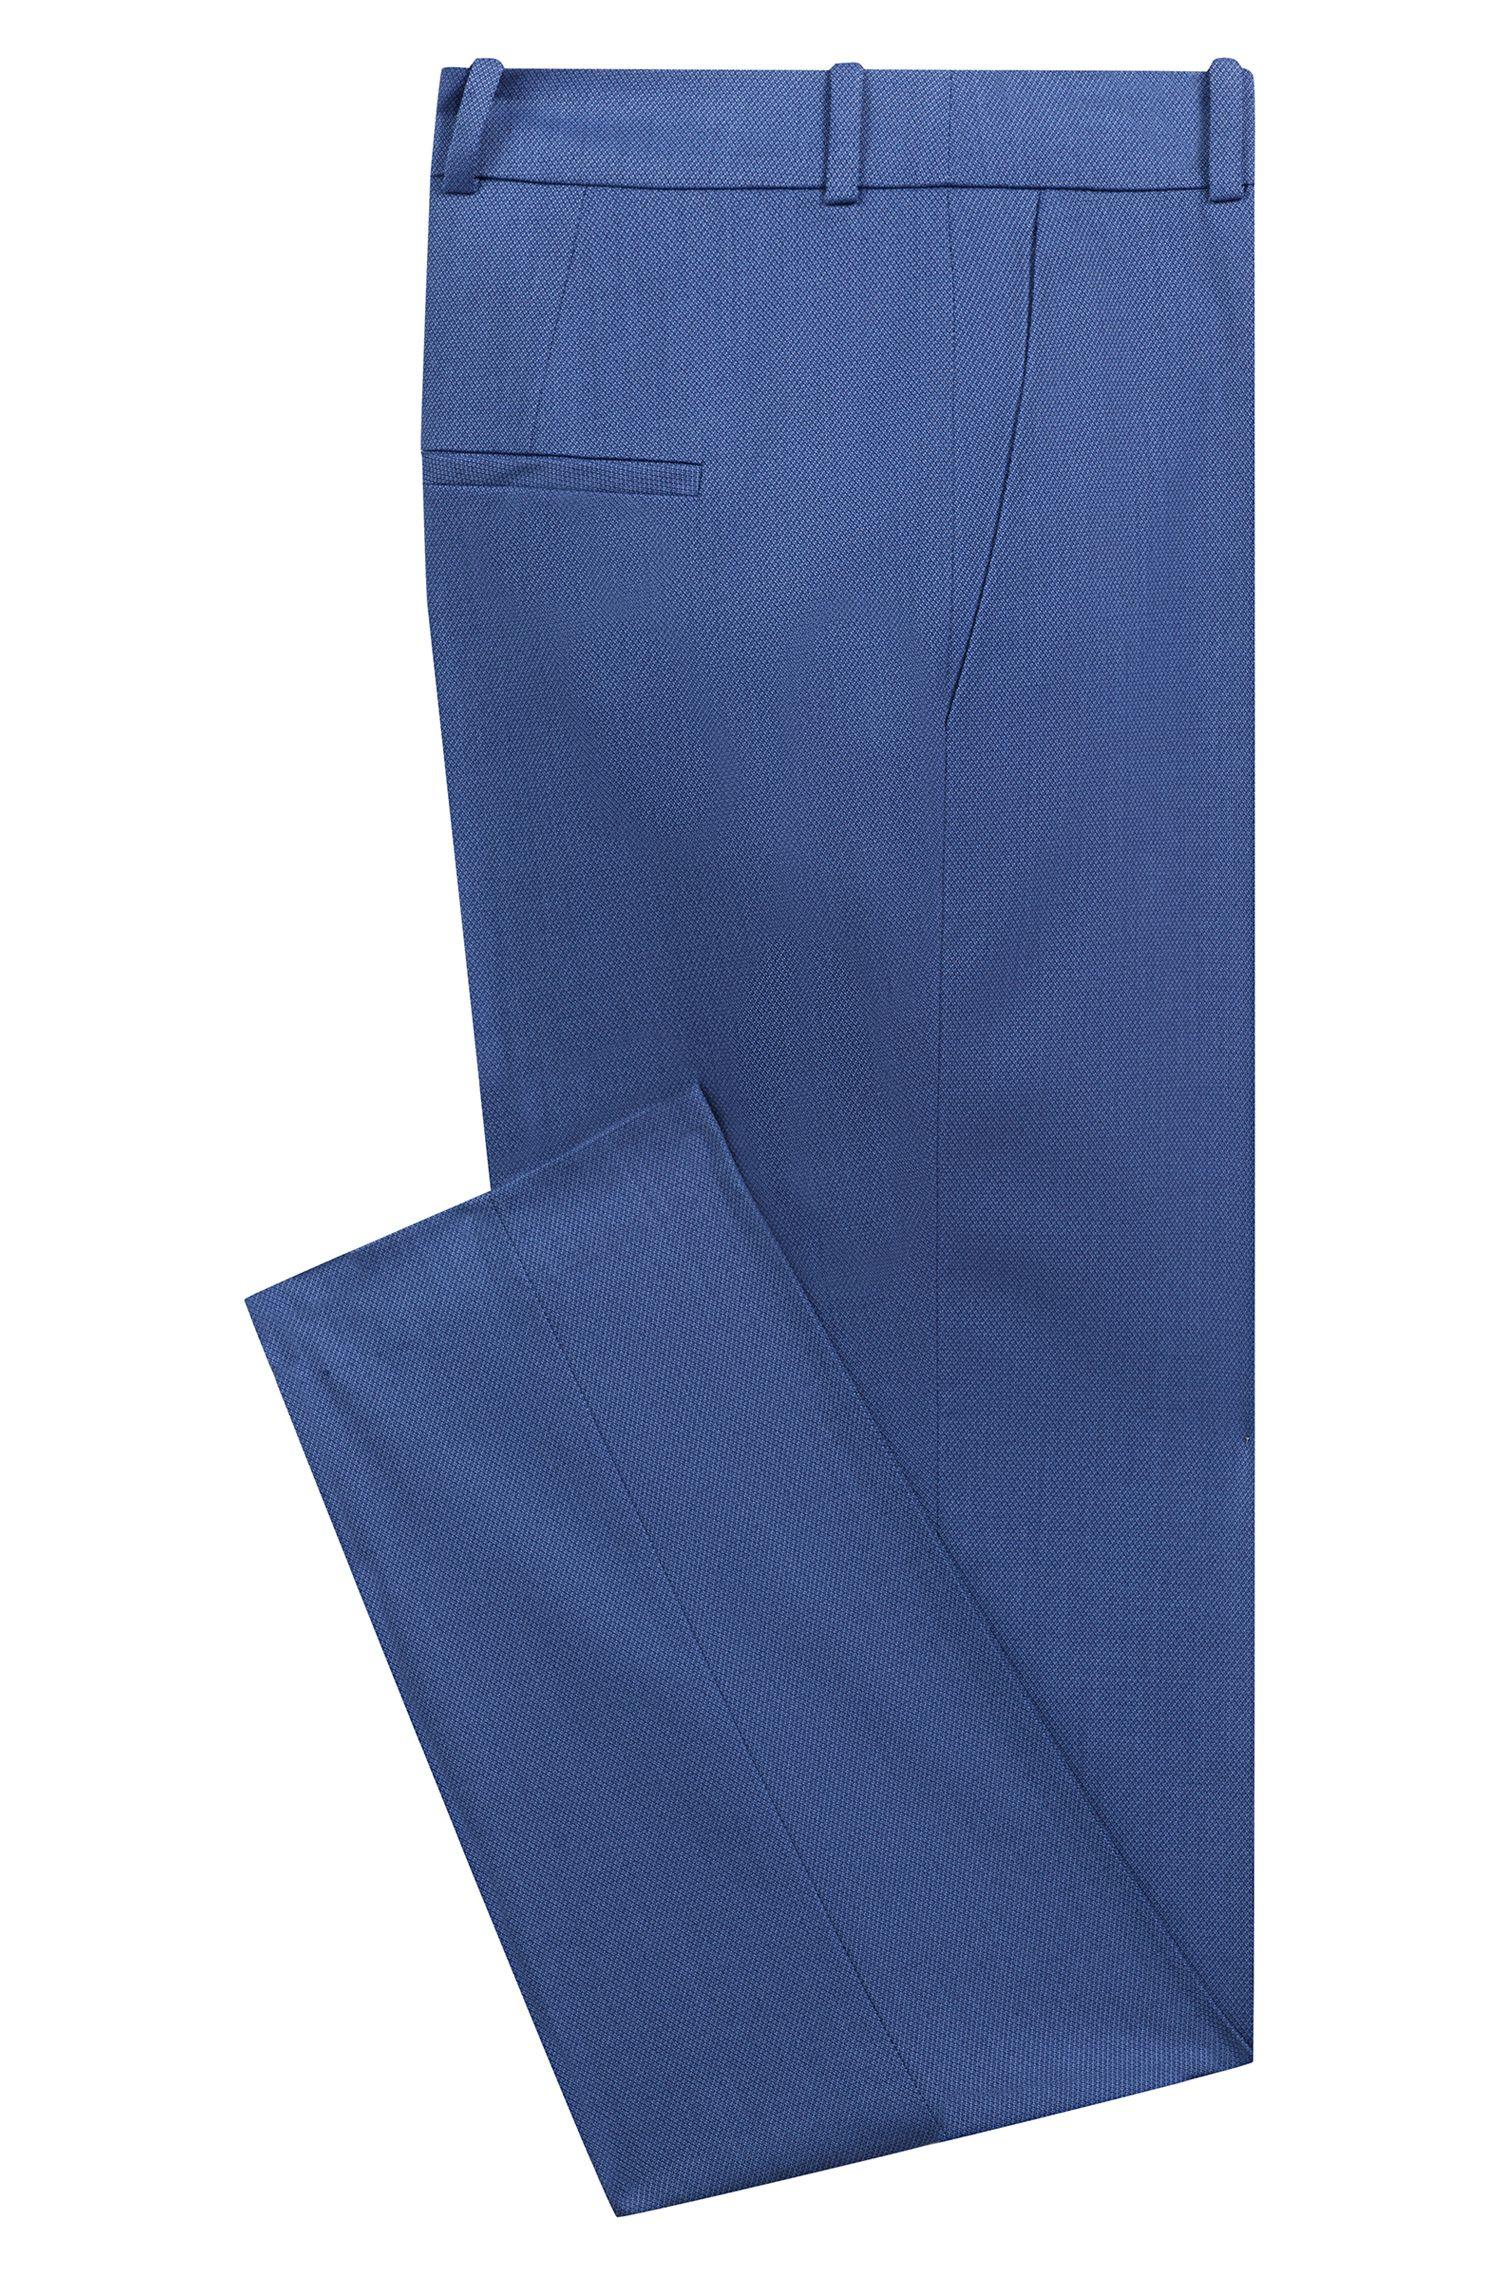 Regular-Fit Zigarettenhose in Cropped-Länge aus gemustertem Stretch-Gewebe, Gemustert